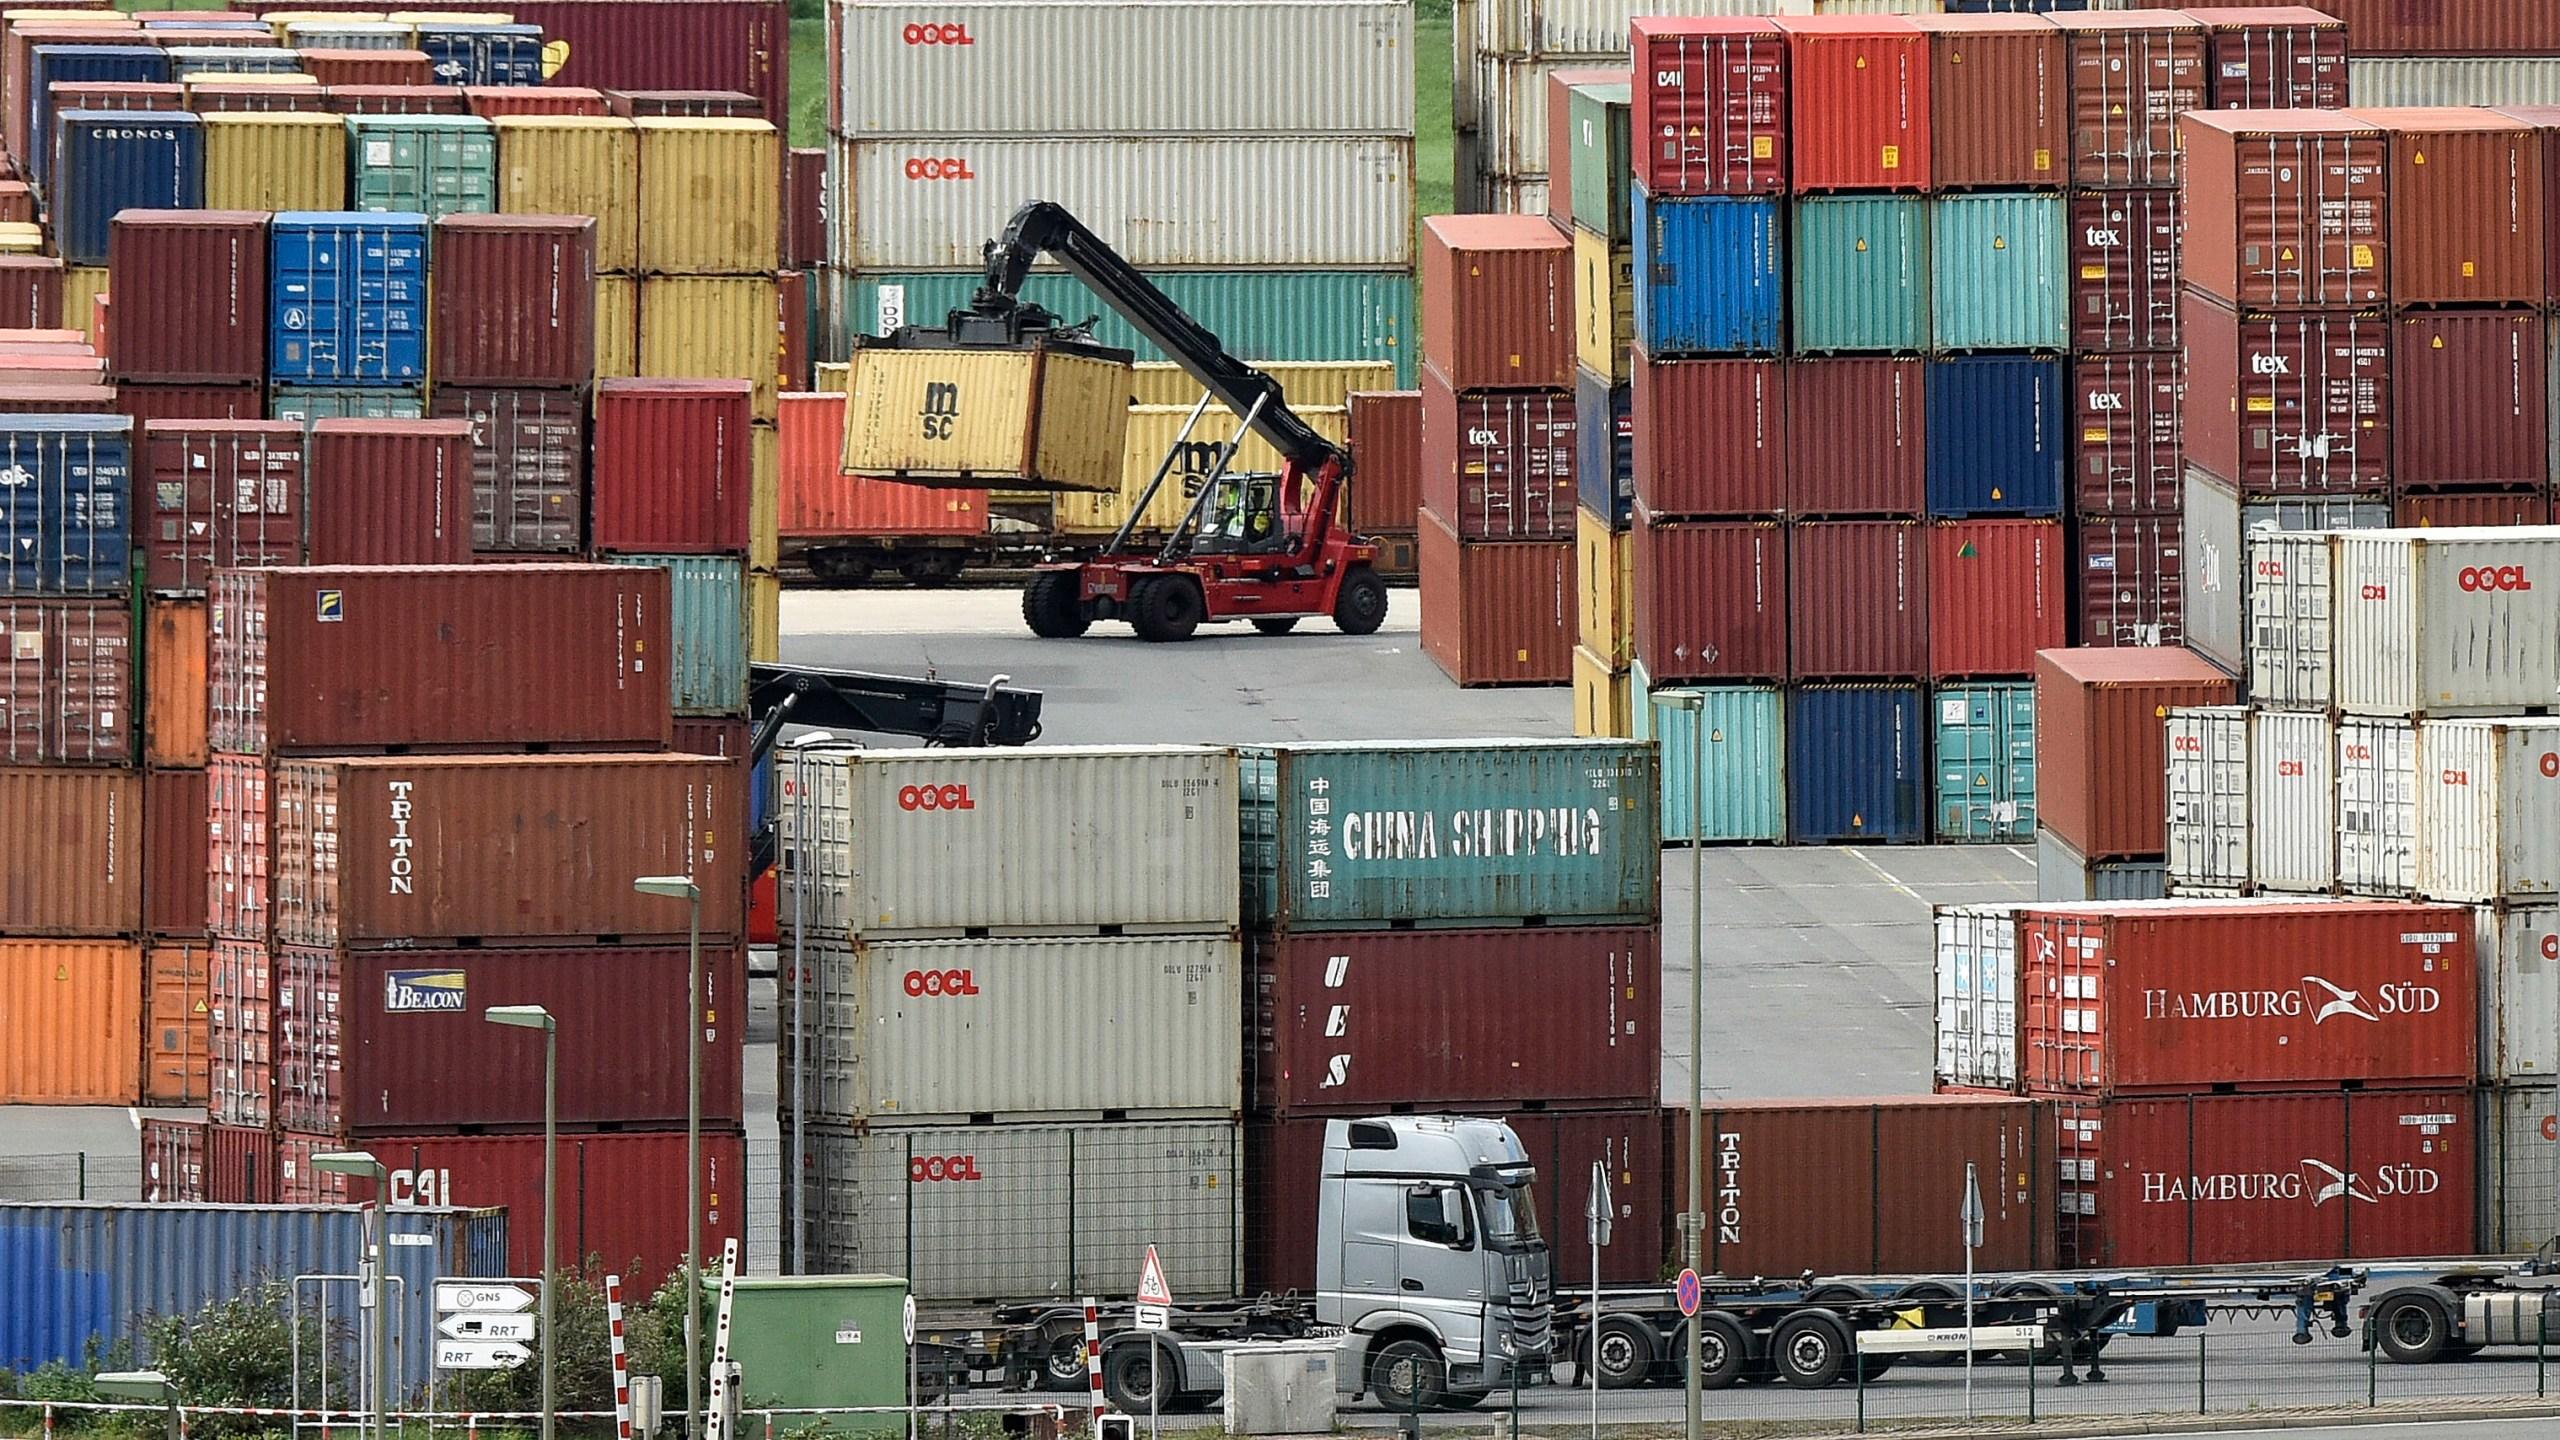 Germany_Exports_49969-159532.jpg85244585